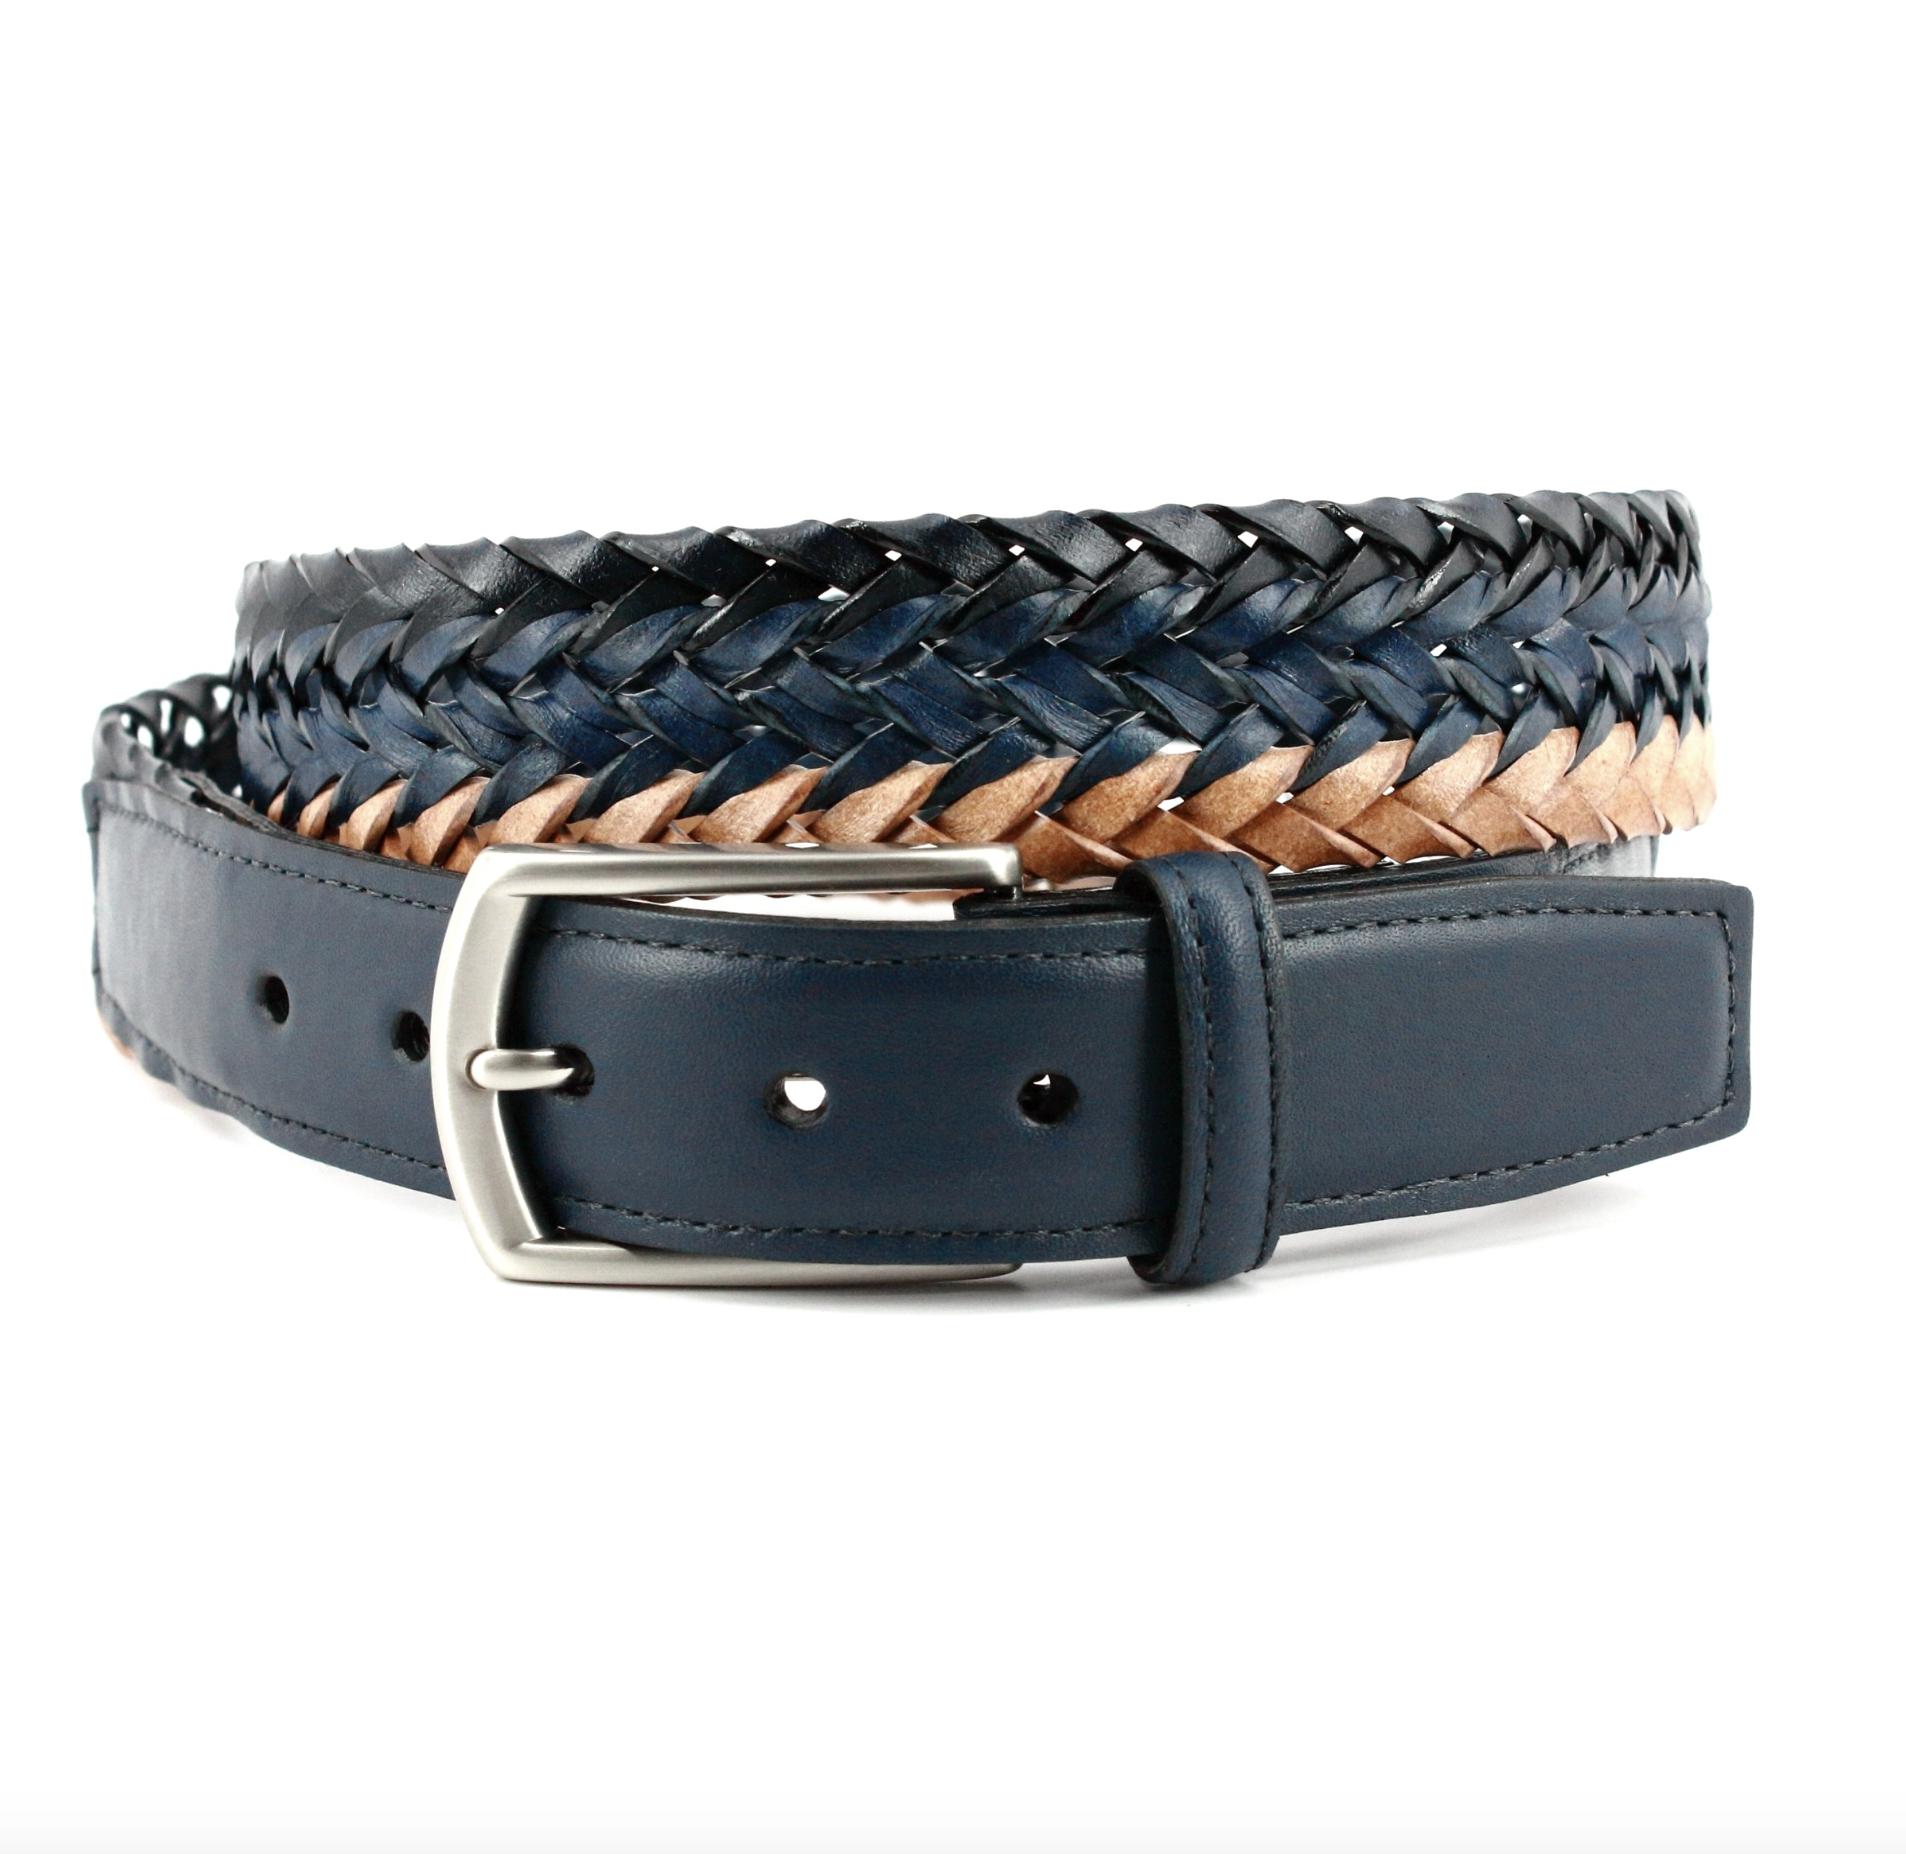 TORINO LEATHER COMPANY Italian Tri Color Woven Leather Belt